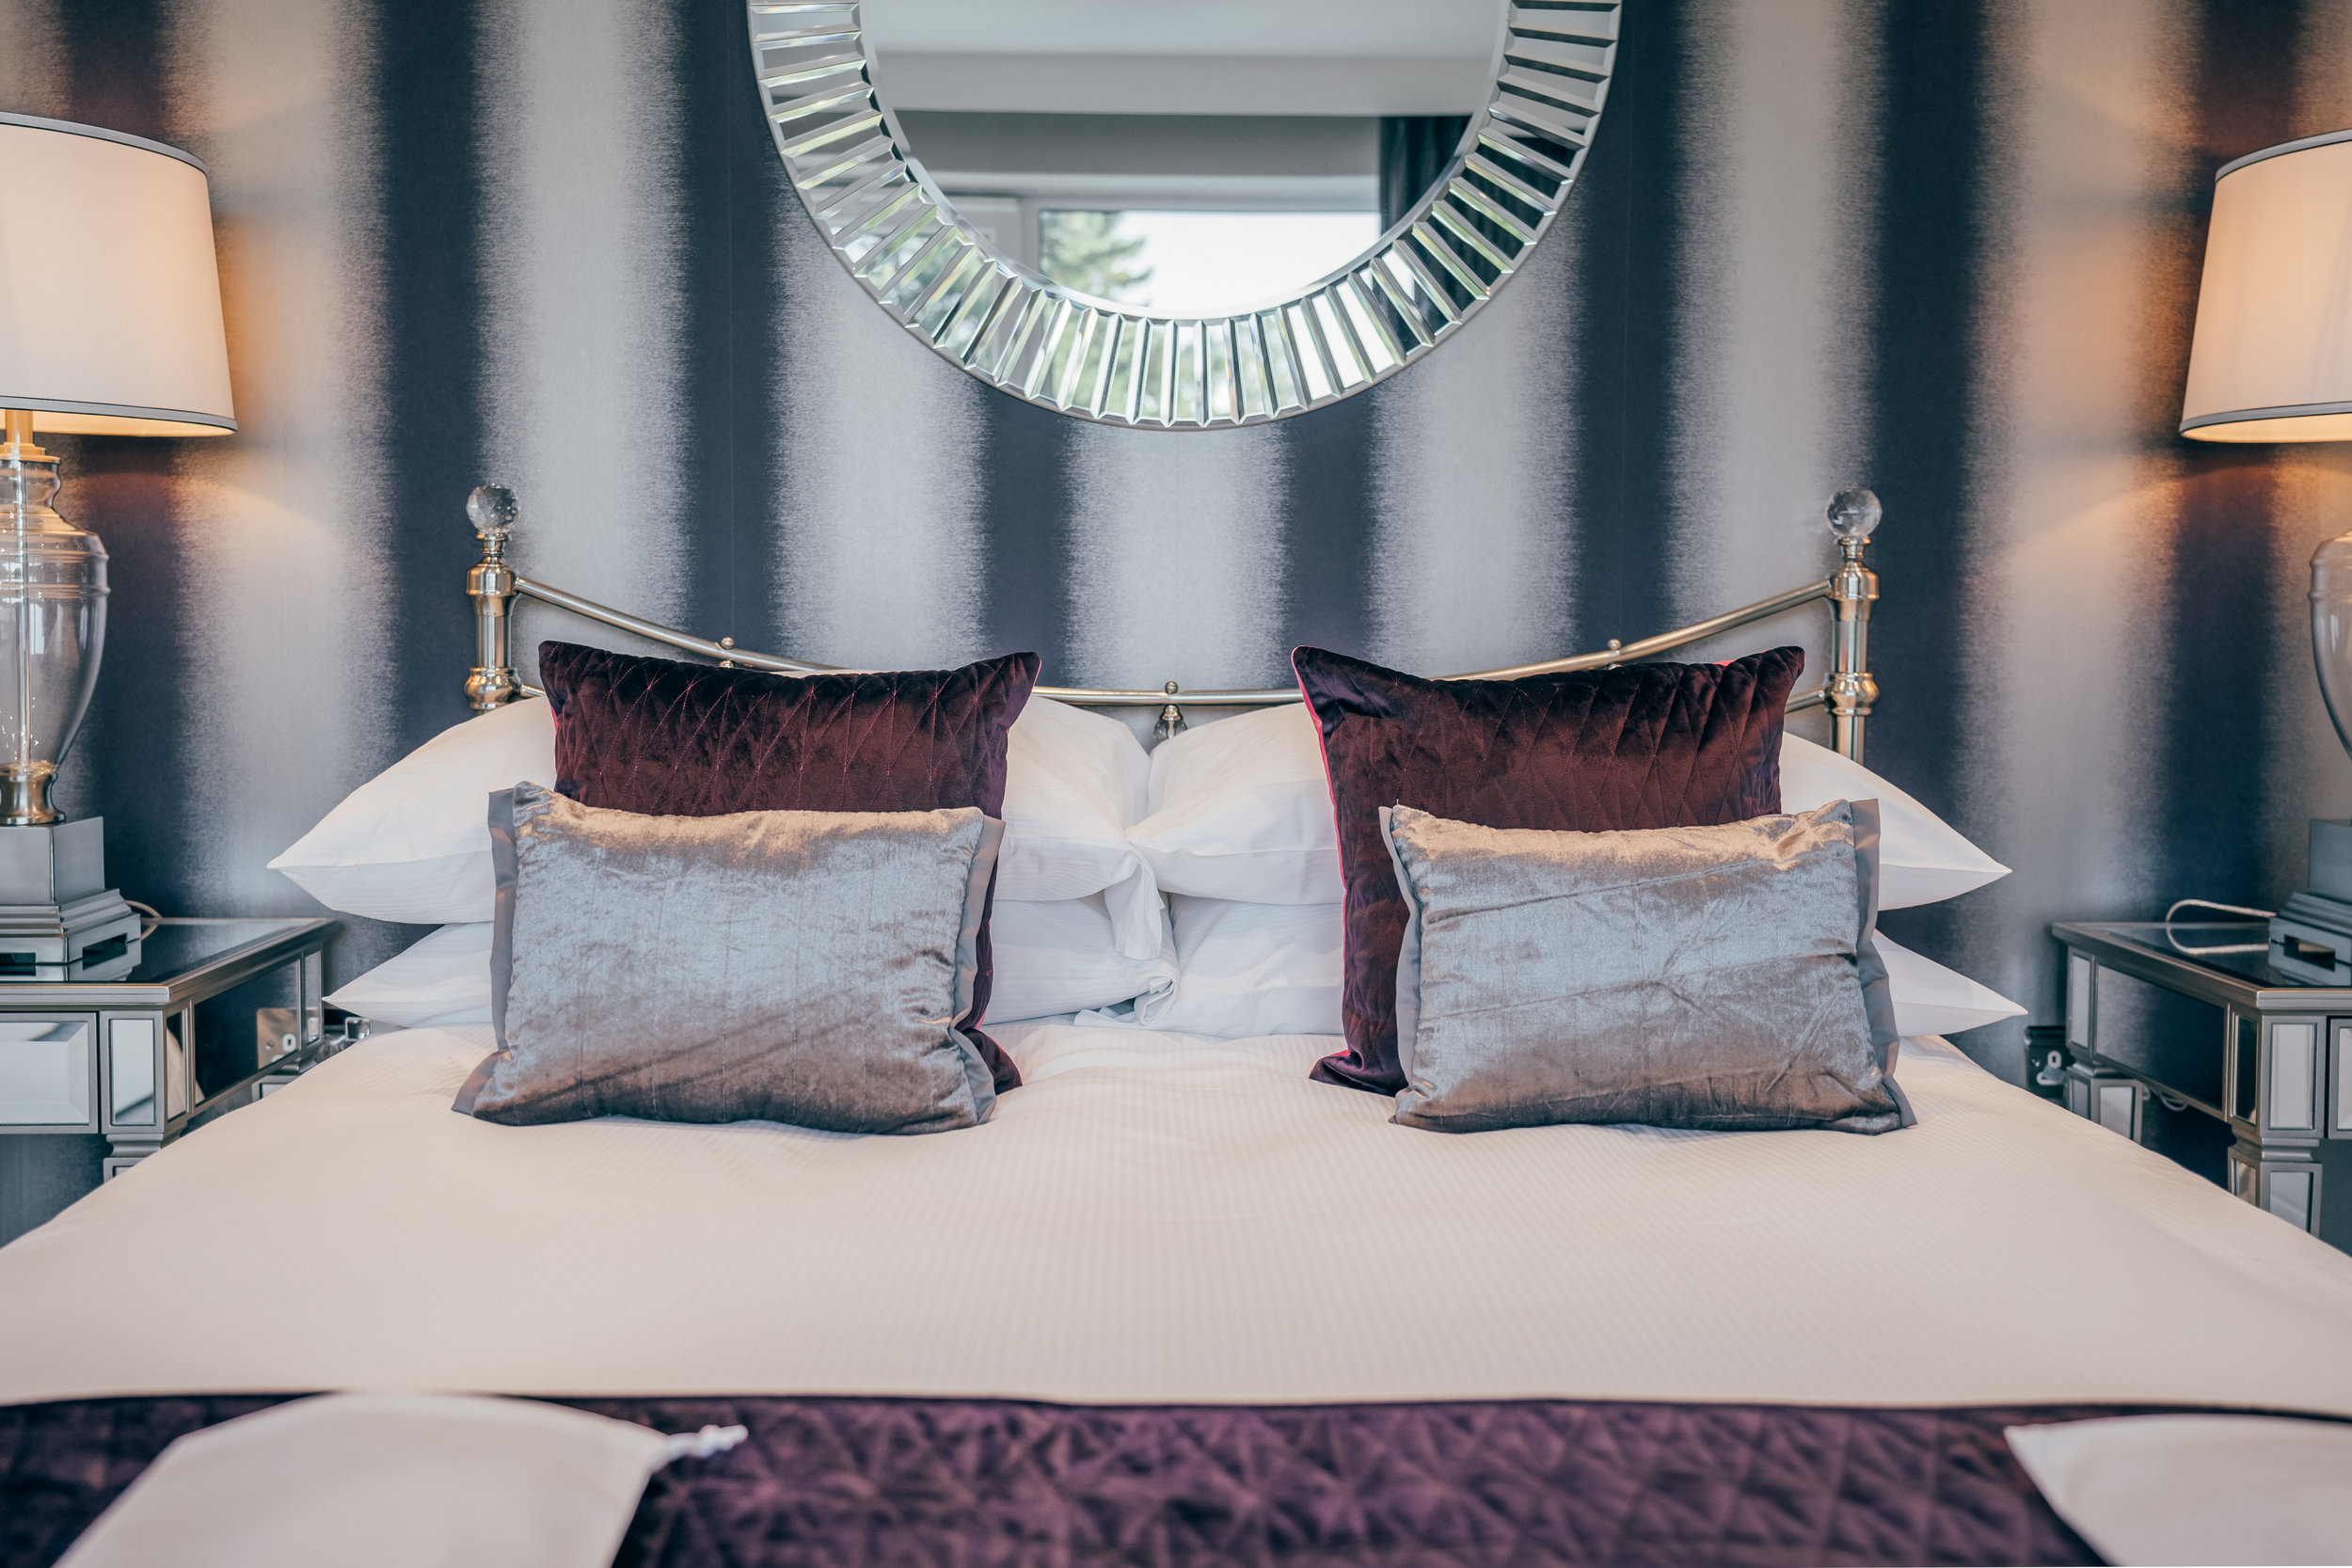 Crisp white bed linens and sleep essence